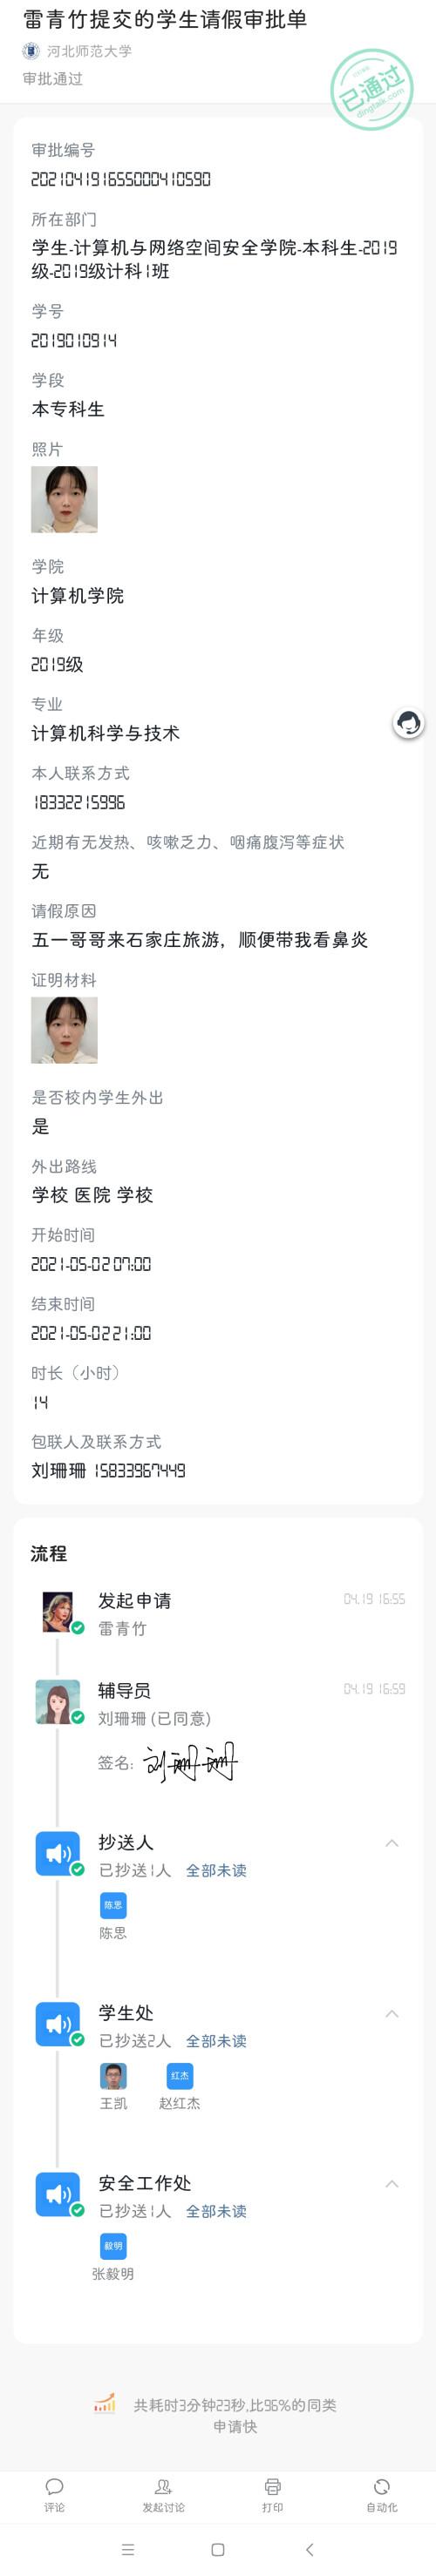 Screenshot 2021 04 30 15 25 20 979 com.alibaba.an(1)